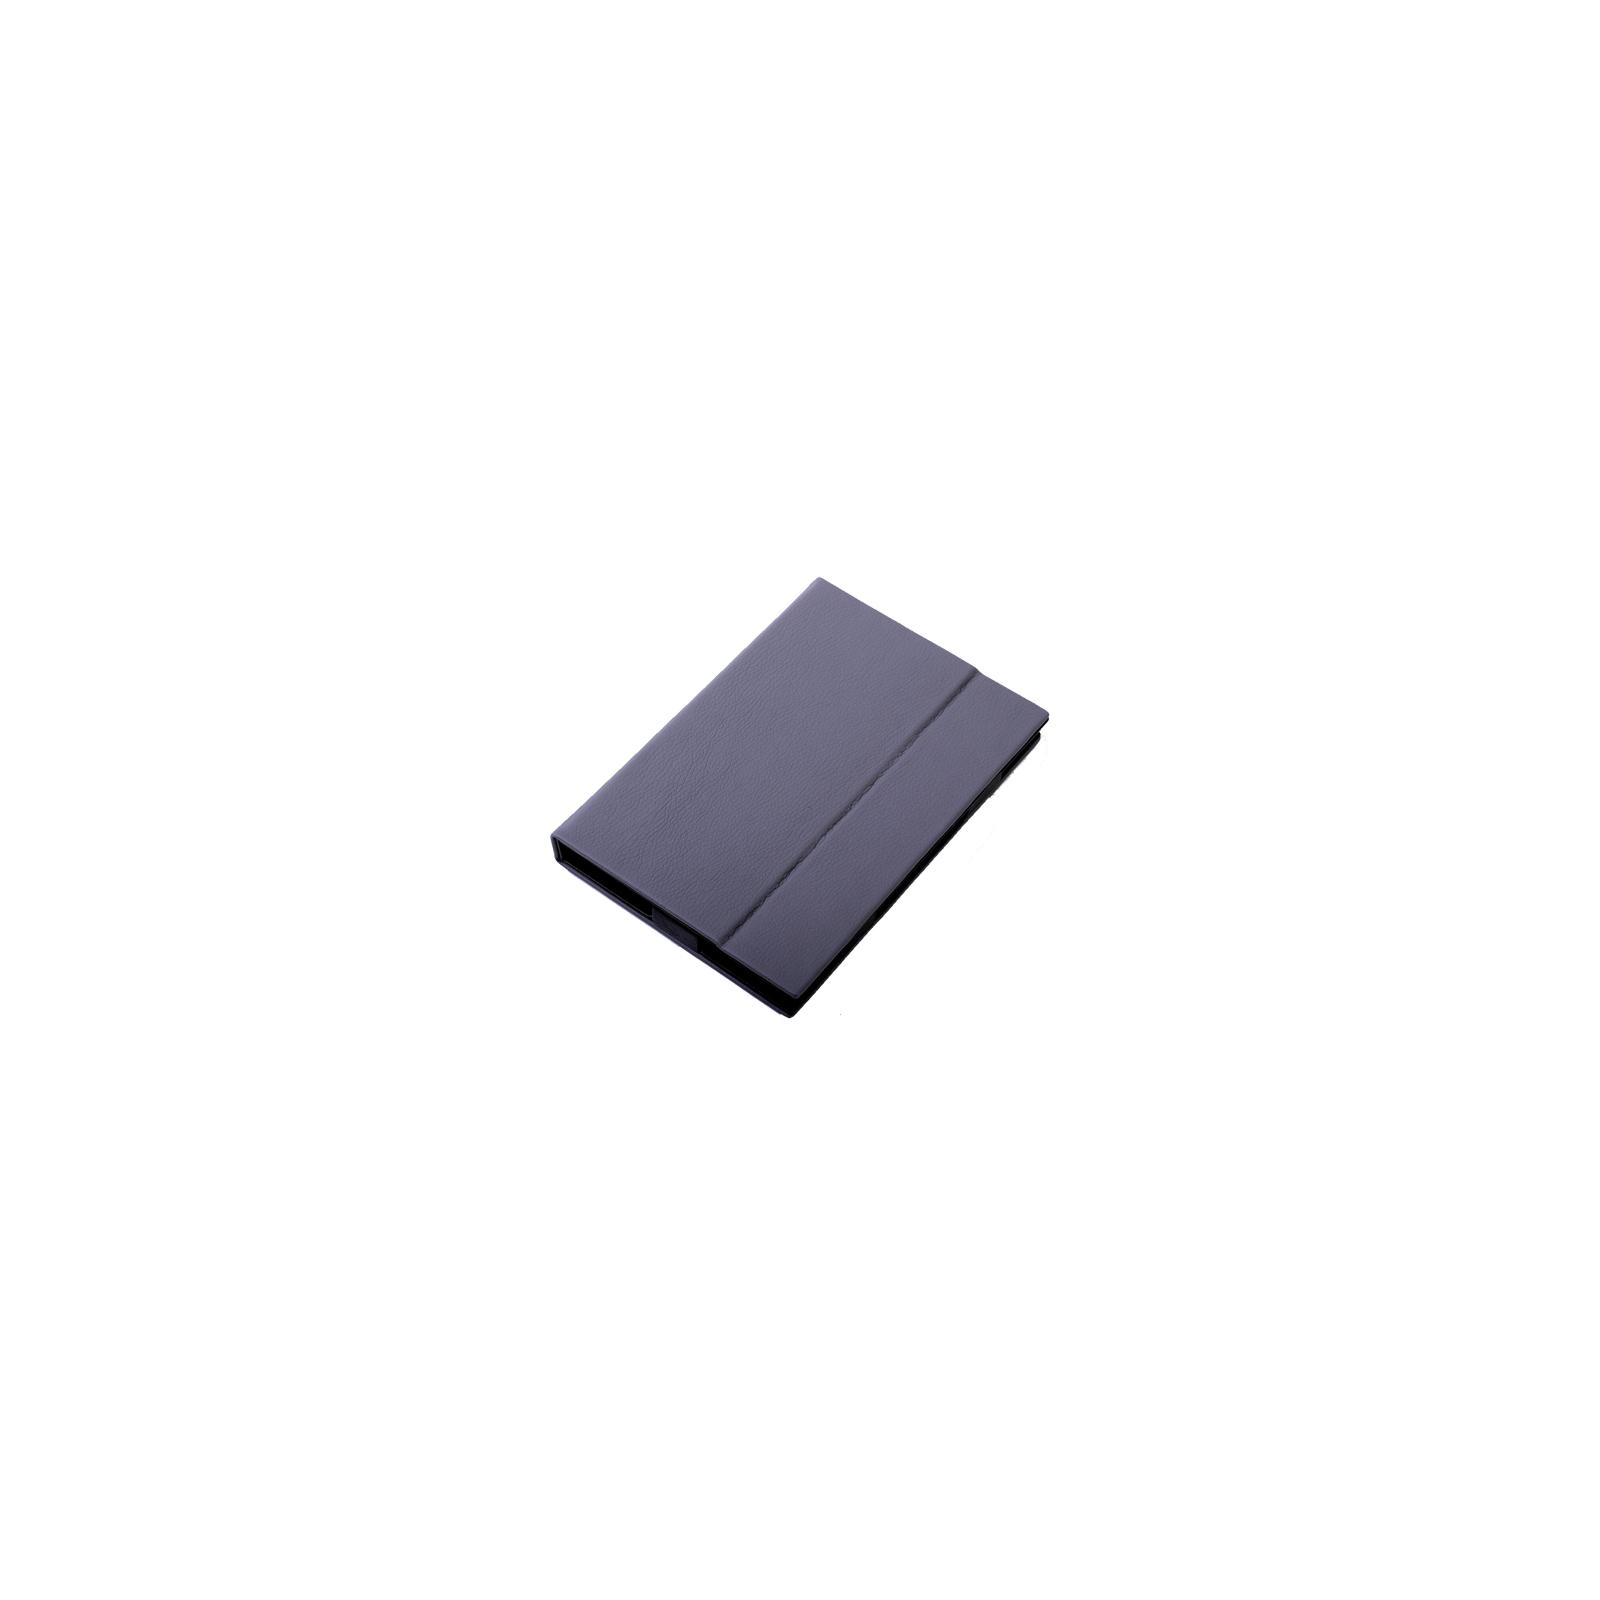 Чехол для планшета Vento 7 Desire Matt - grey